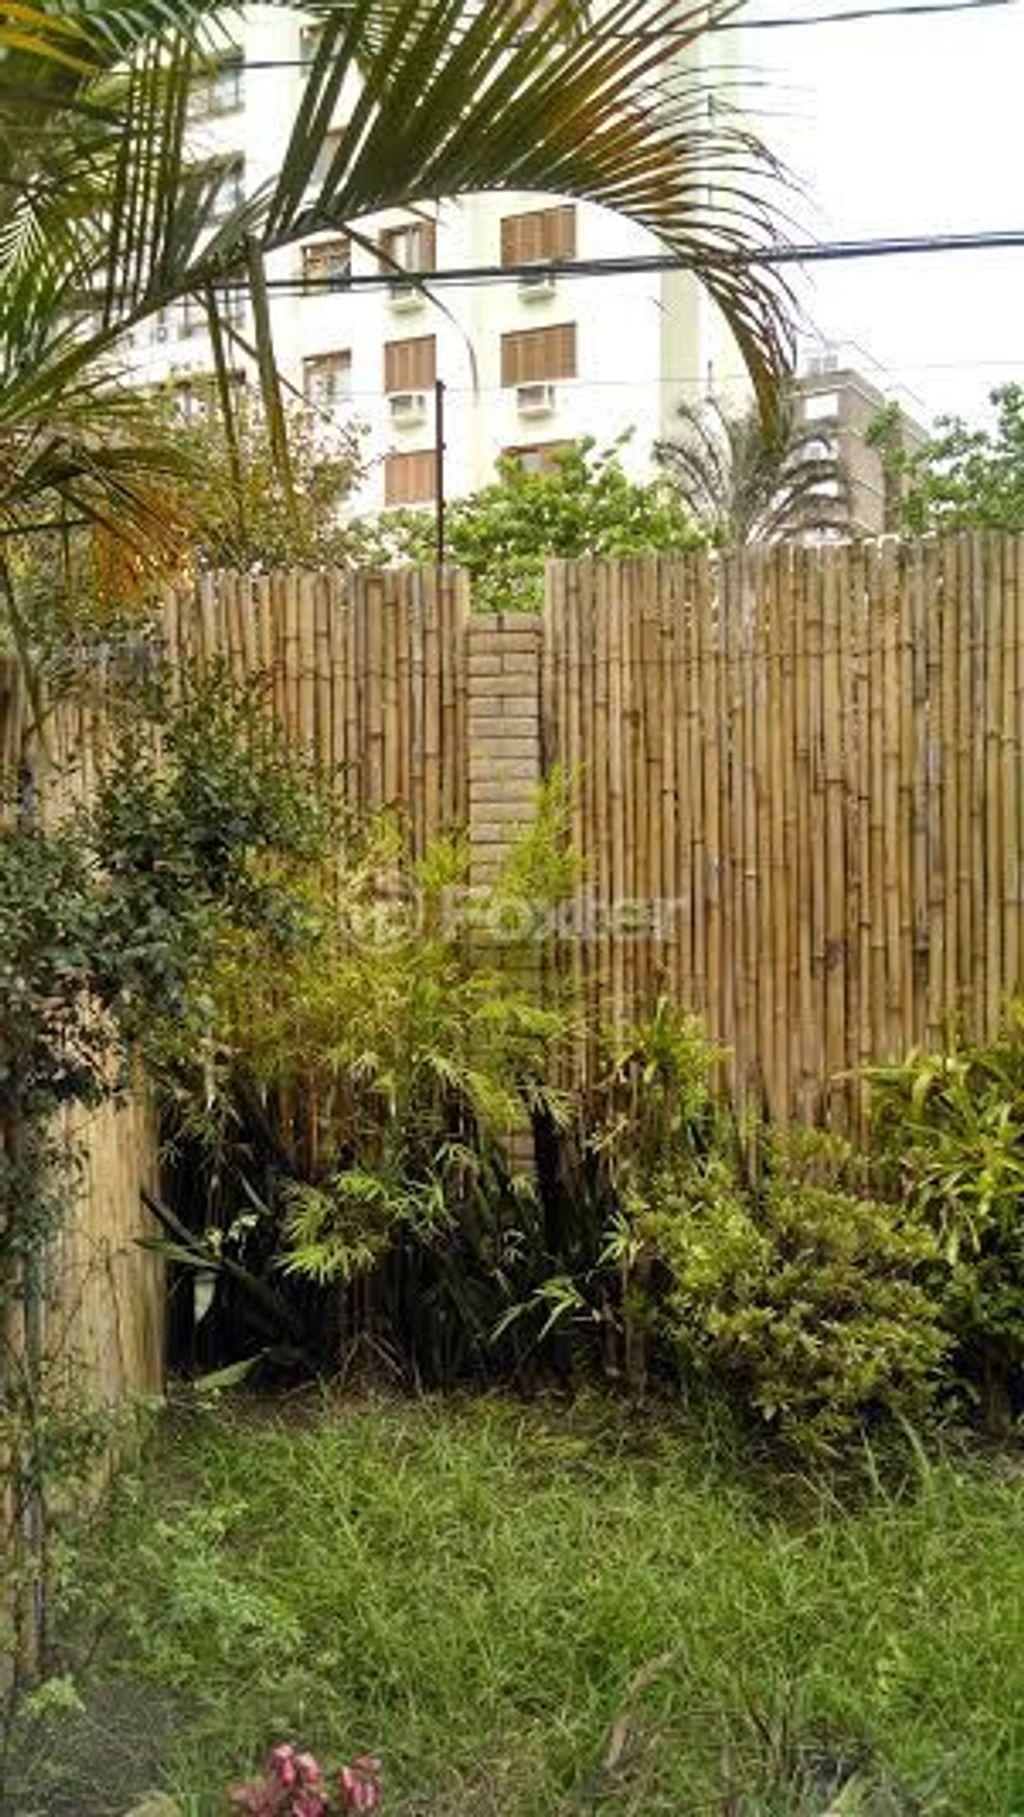 Casa 3 Dorm, Jardim Itu Sabará, Porto Alegre (5388) - Foto 33